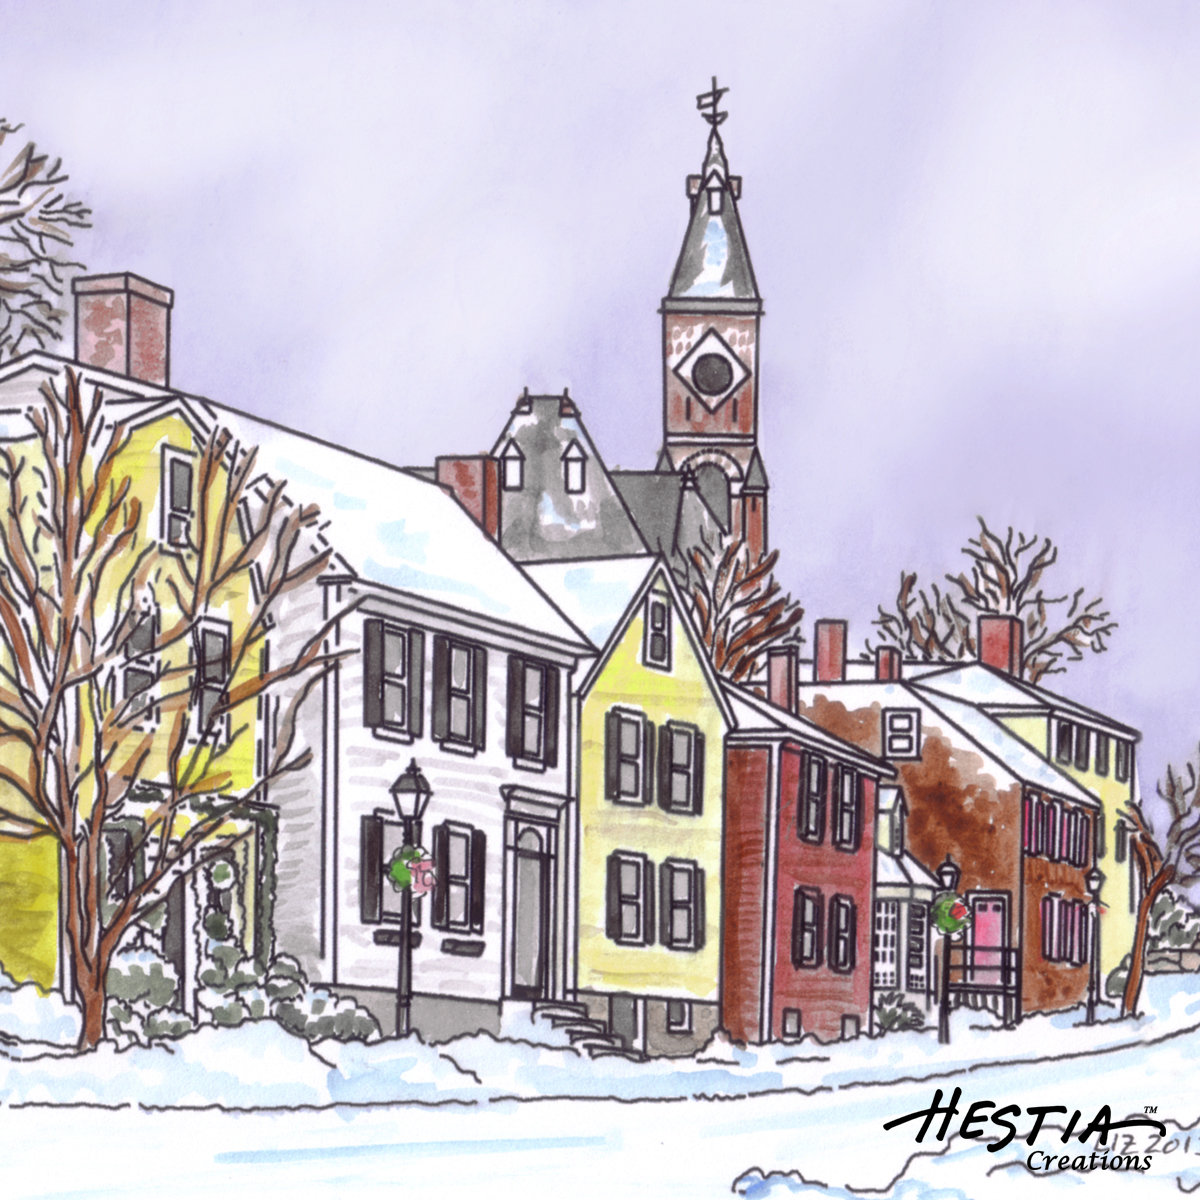 Washington Street in Winter